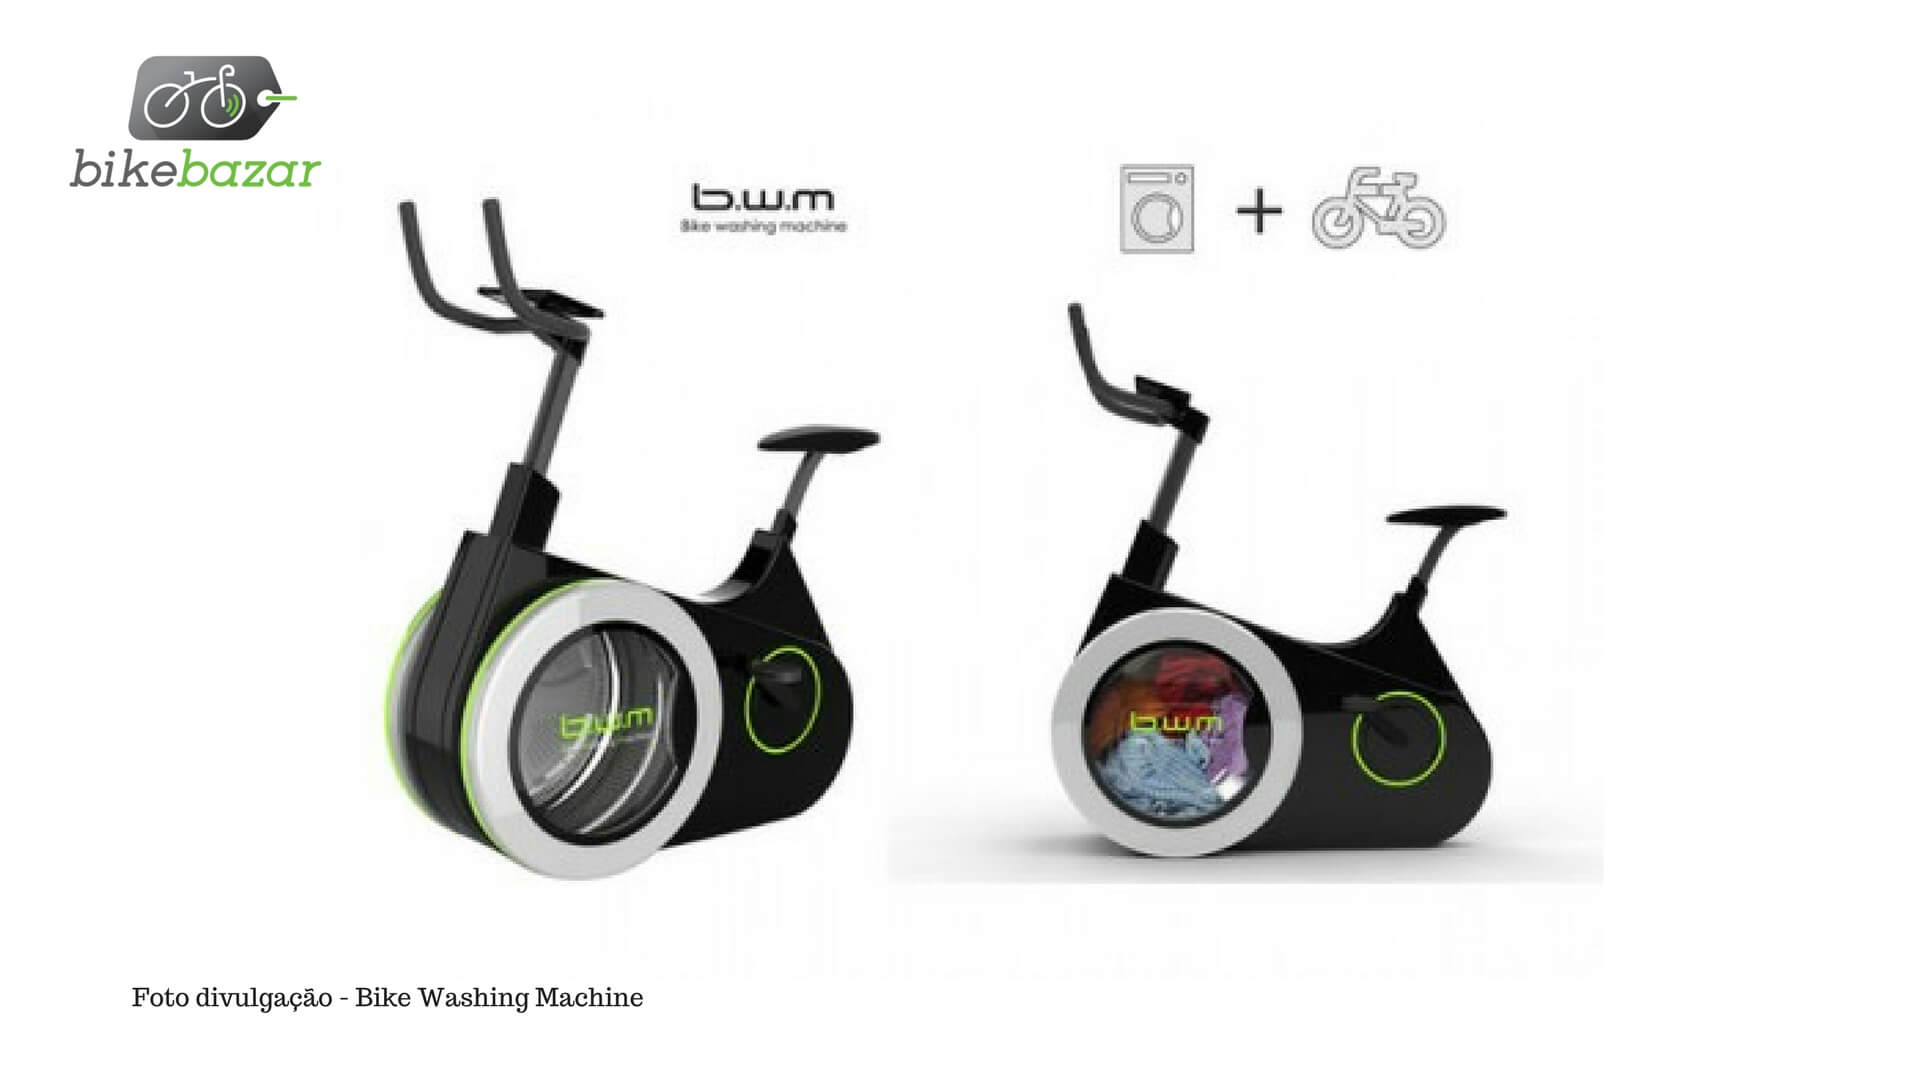 Bicicleta que lava roupa